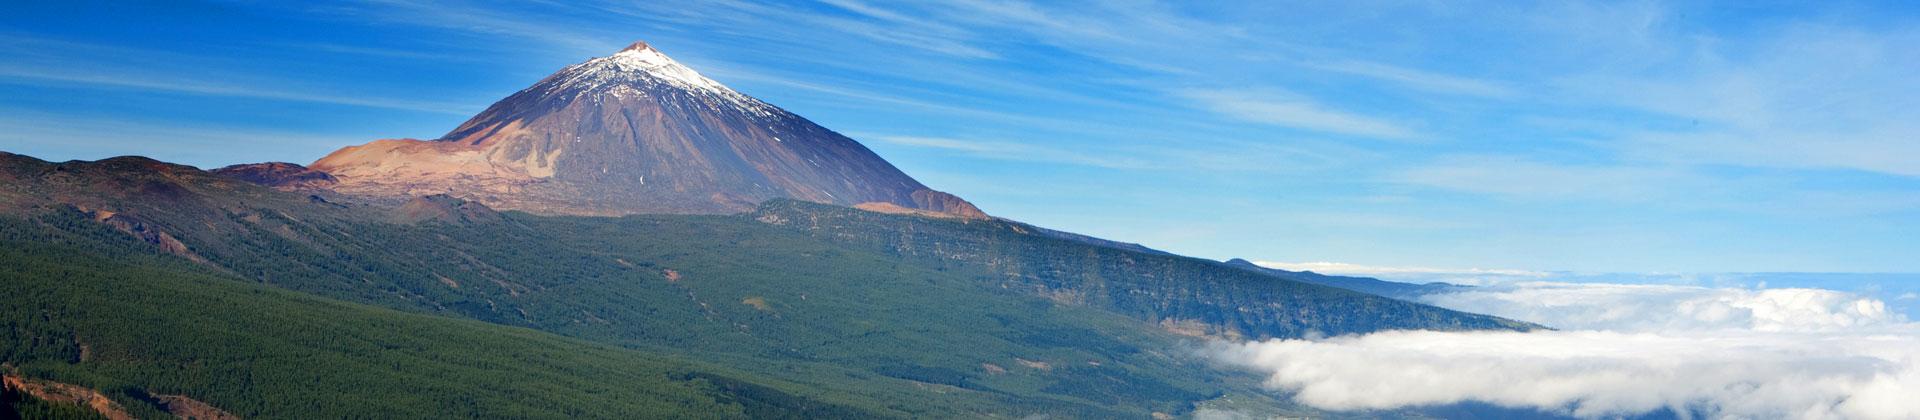 https://www.goodmorningtenerife.com/wp-content/uploads/2014/08/06_slide_teide_GM_Tenerife.jpg